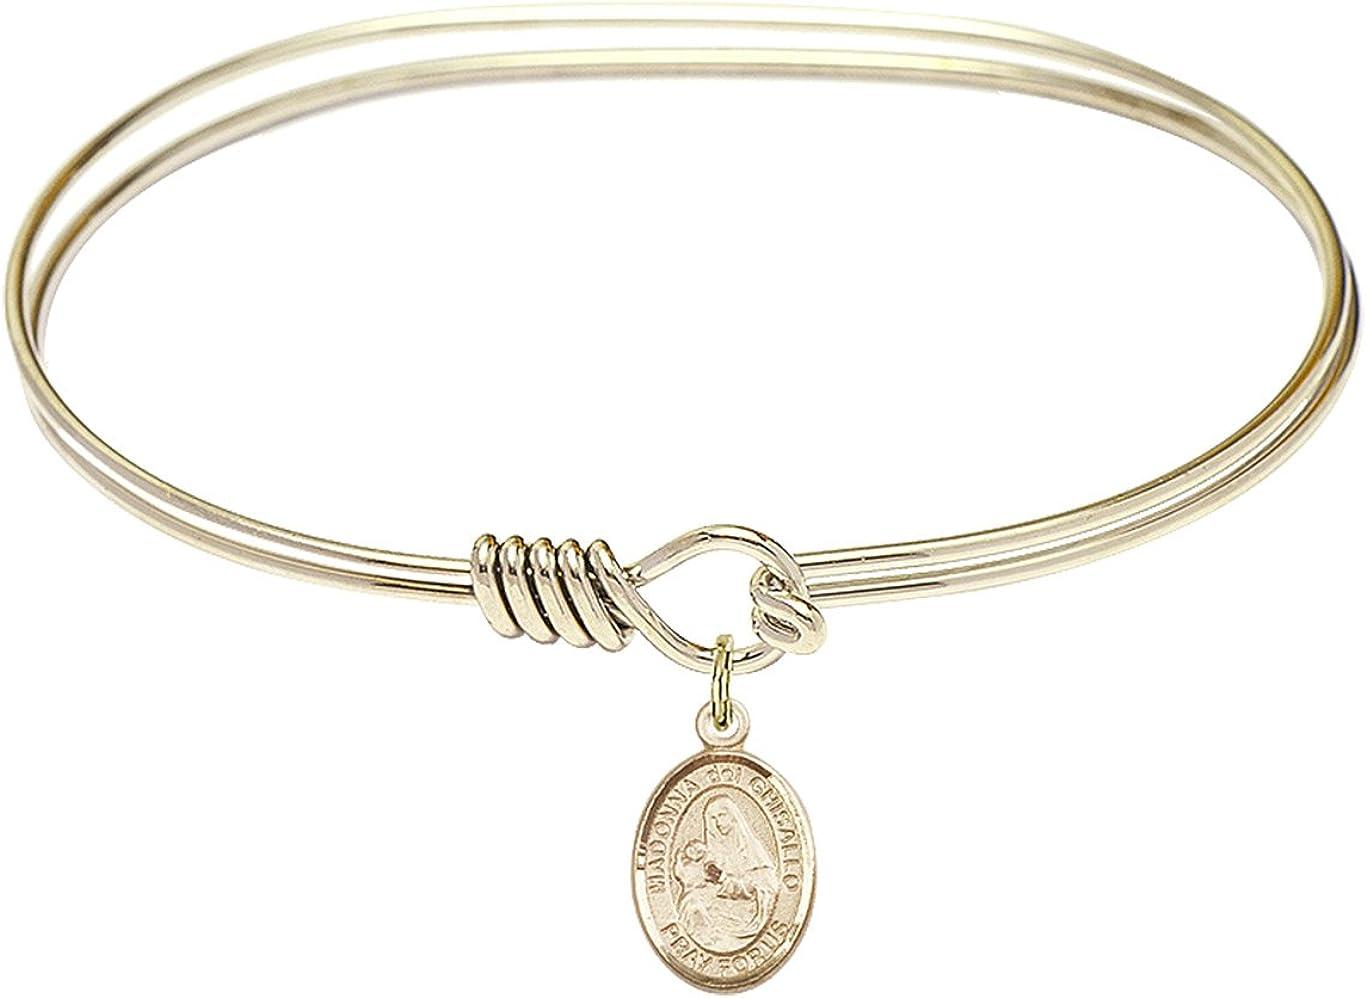 Joseph of Cupertino Charm. DiamondJewelryNY Eye Hook Bangle Bracelet with a St